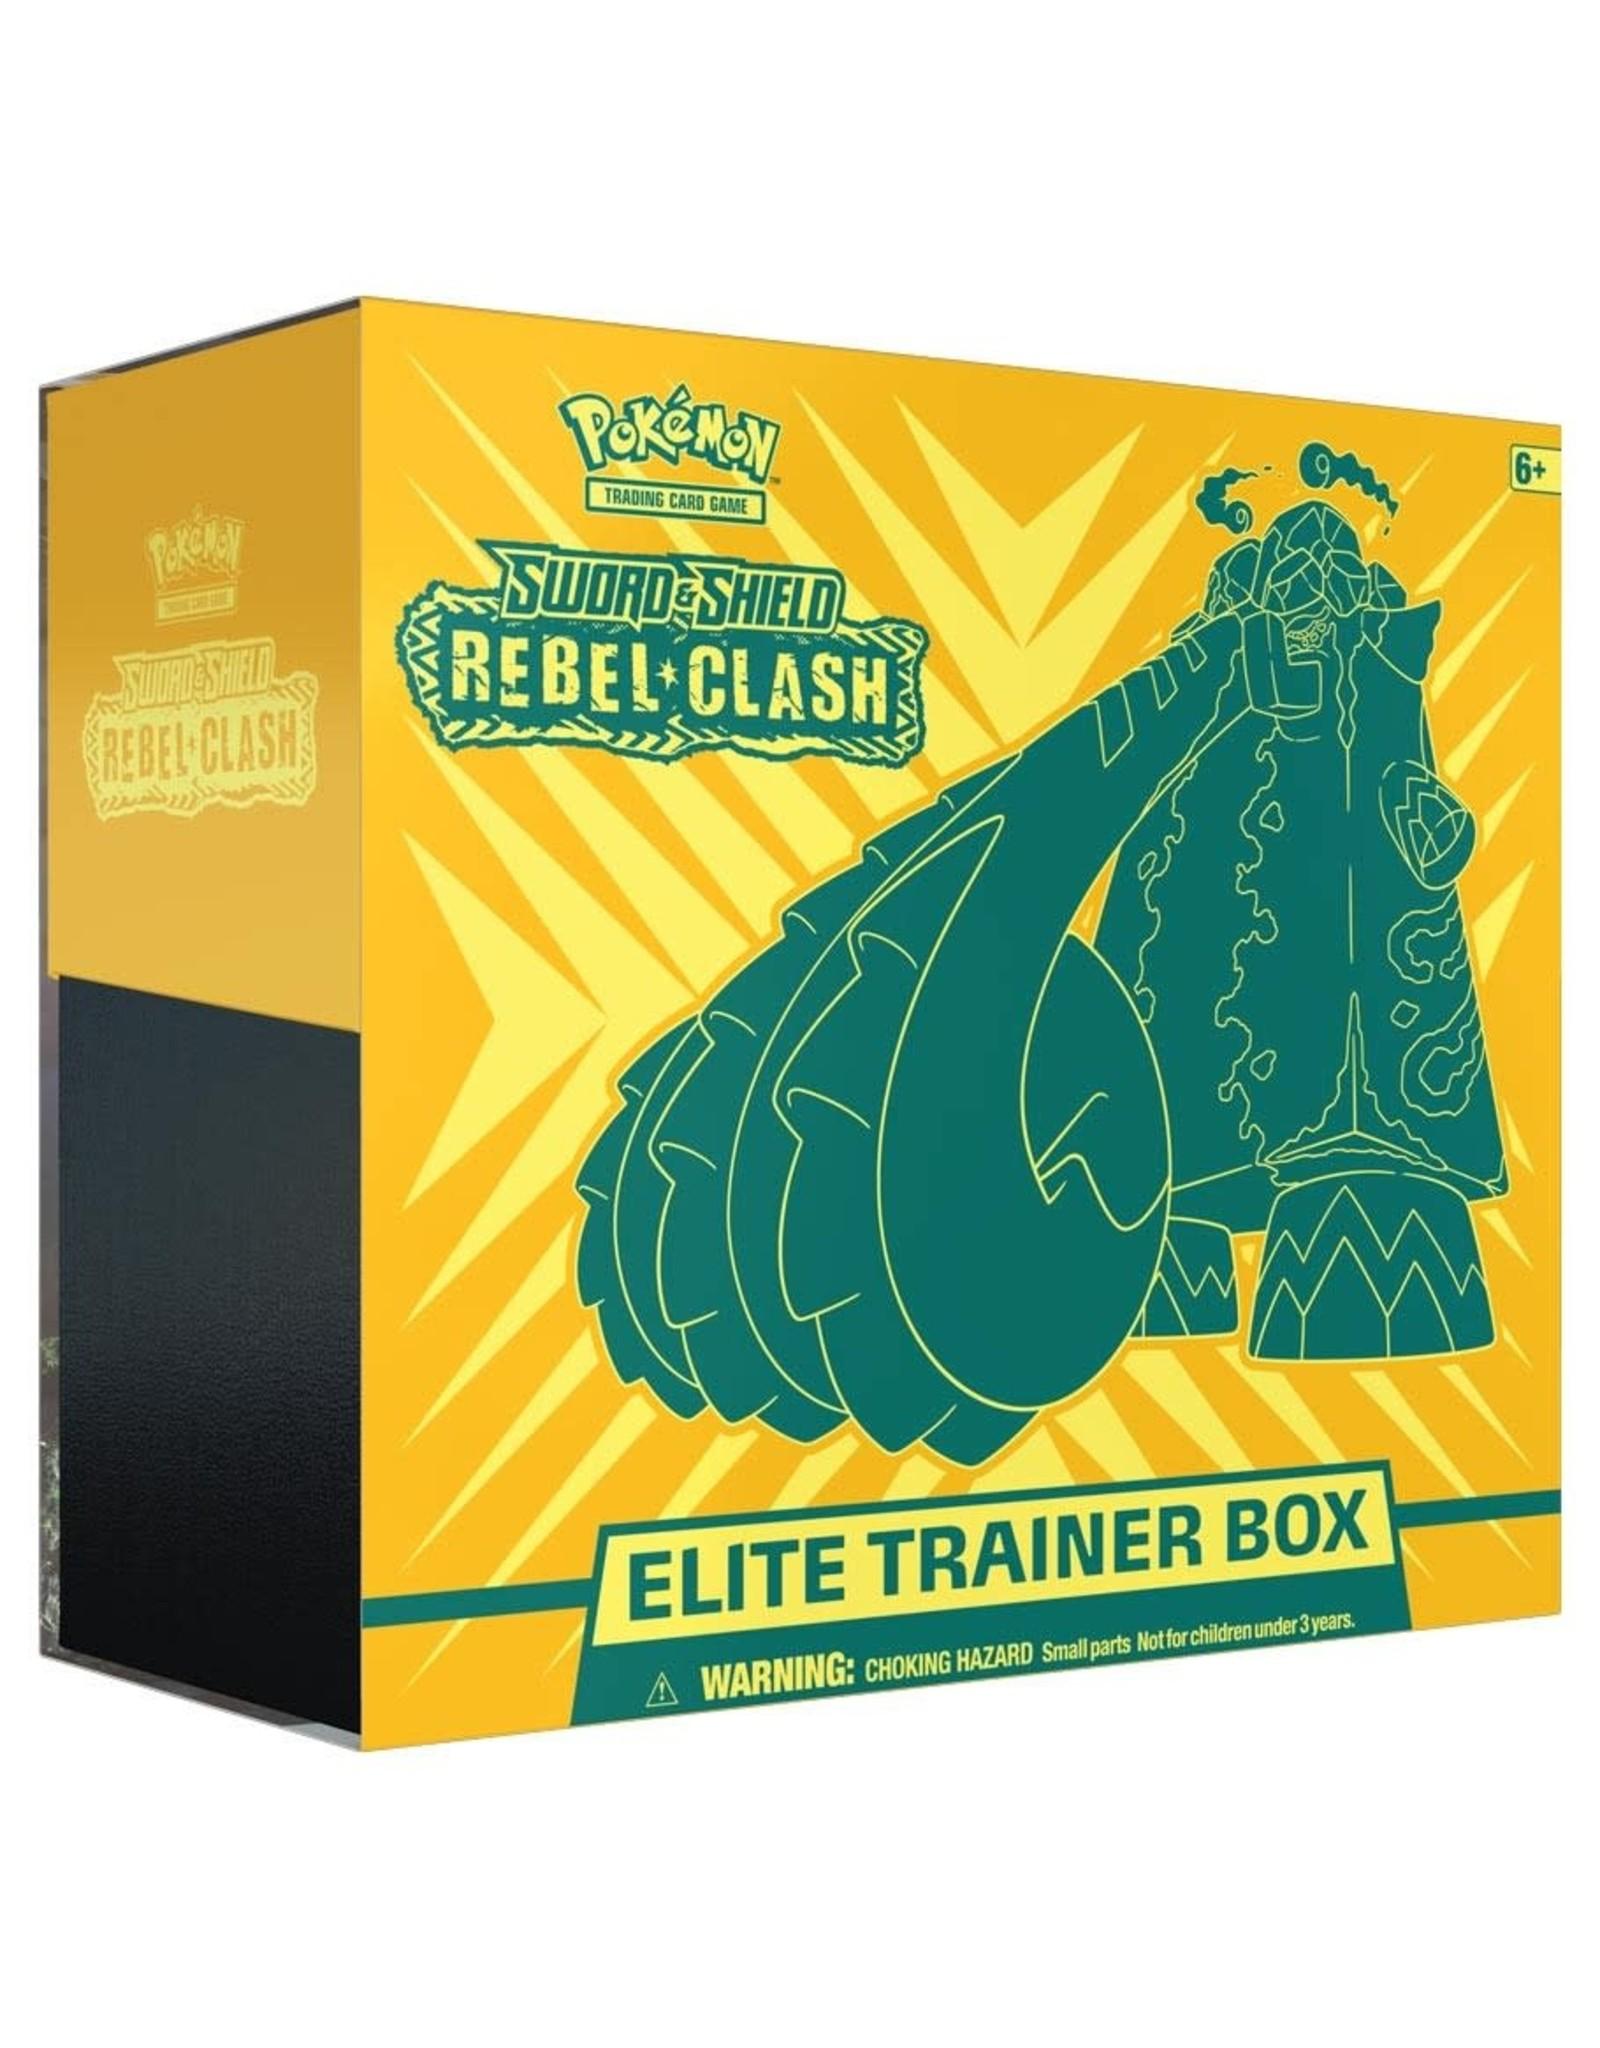 S&S2: Rebel Clash Elite Trainer Box